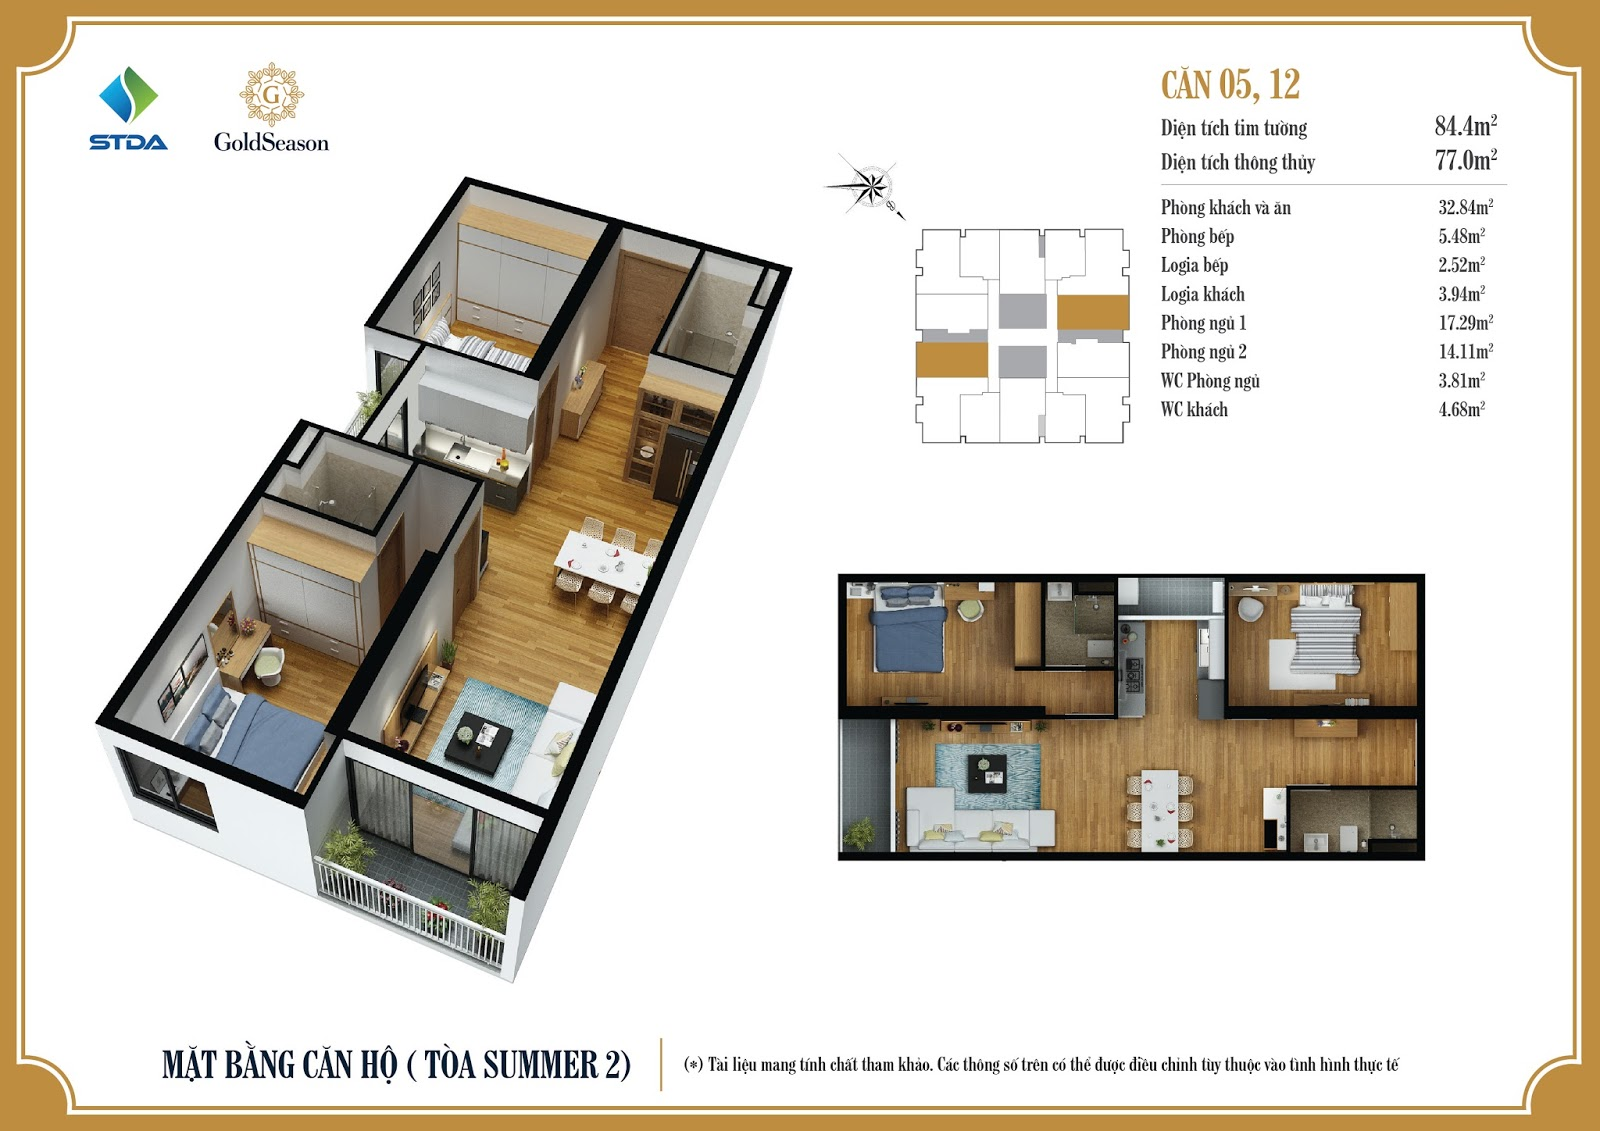 thiết kế căn hộ goldseason